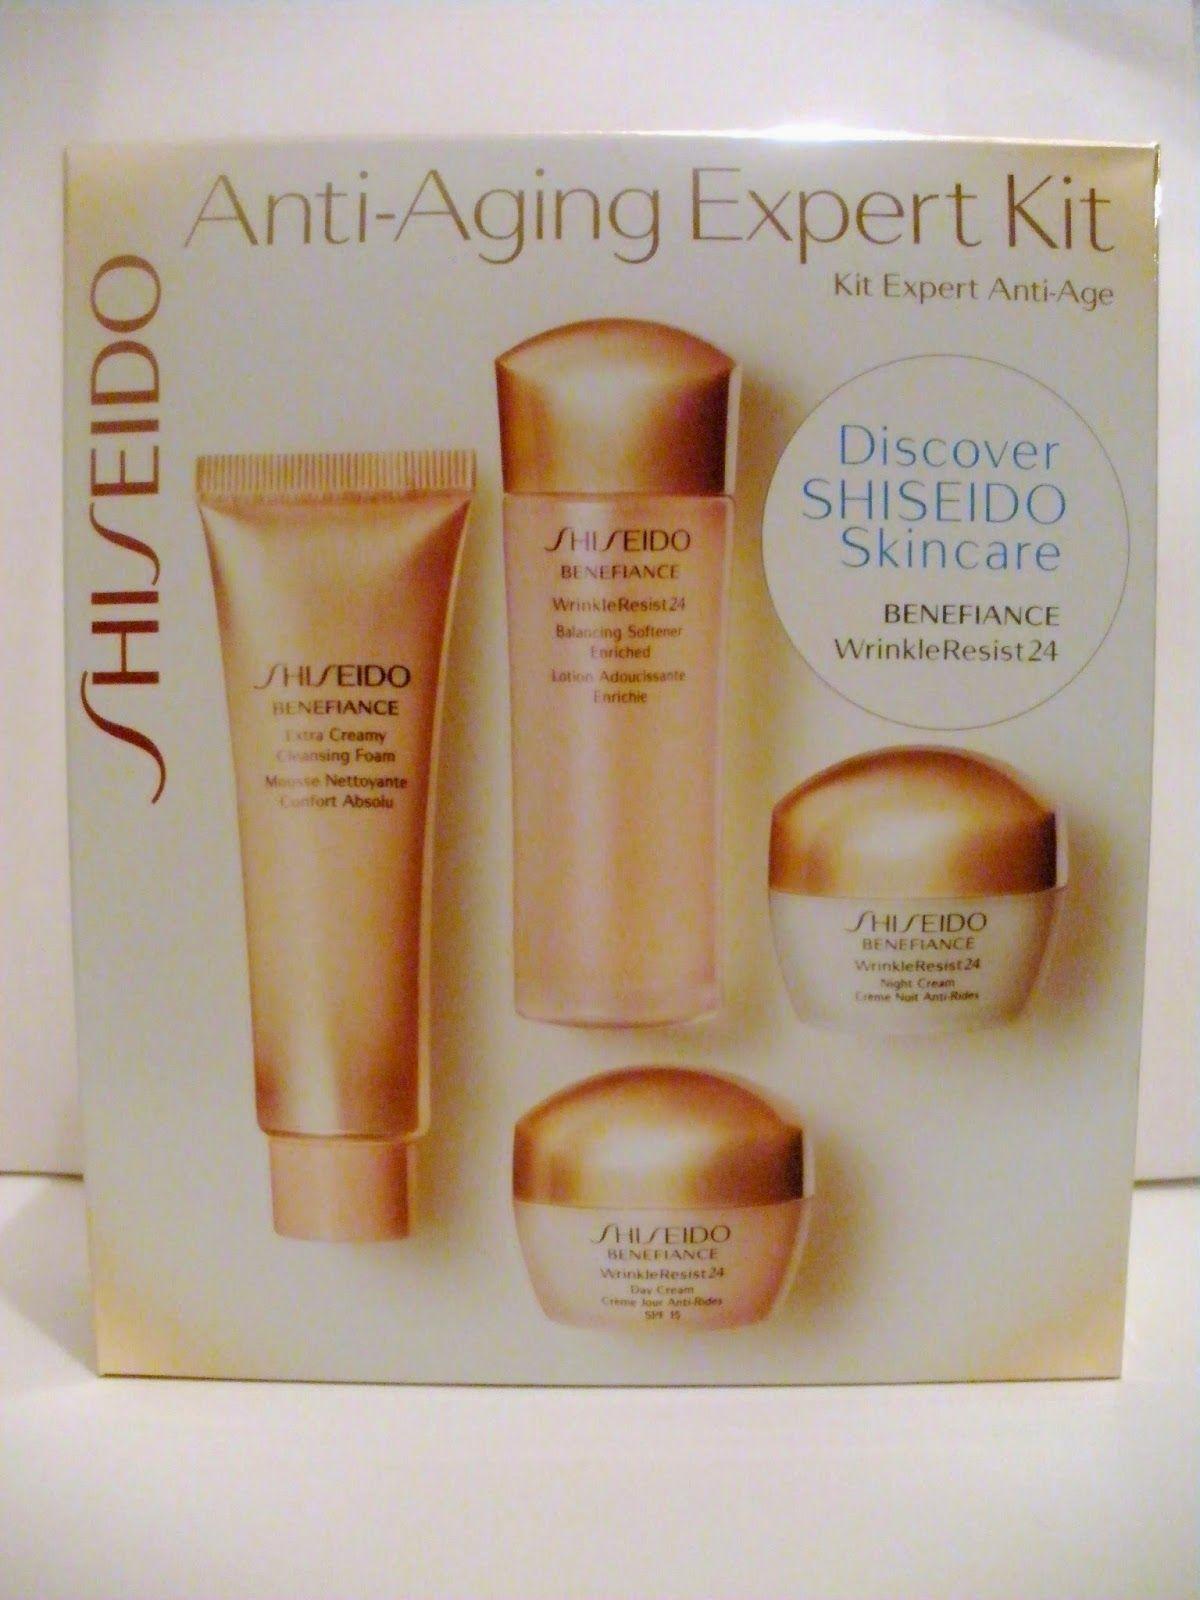 shiseido anti aging expert kit